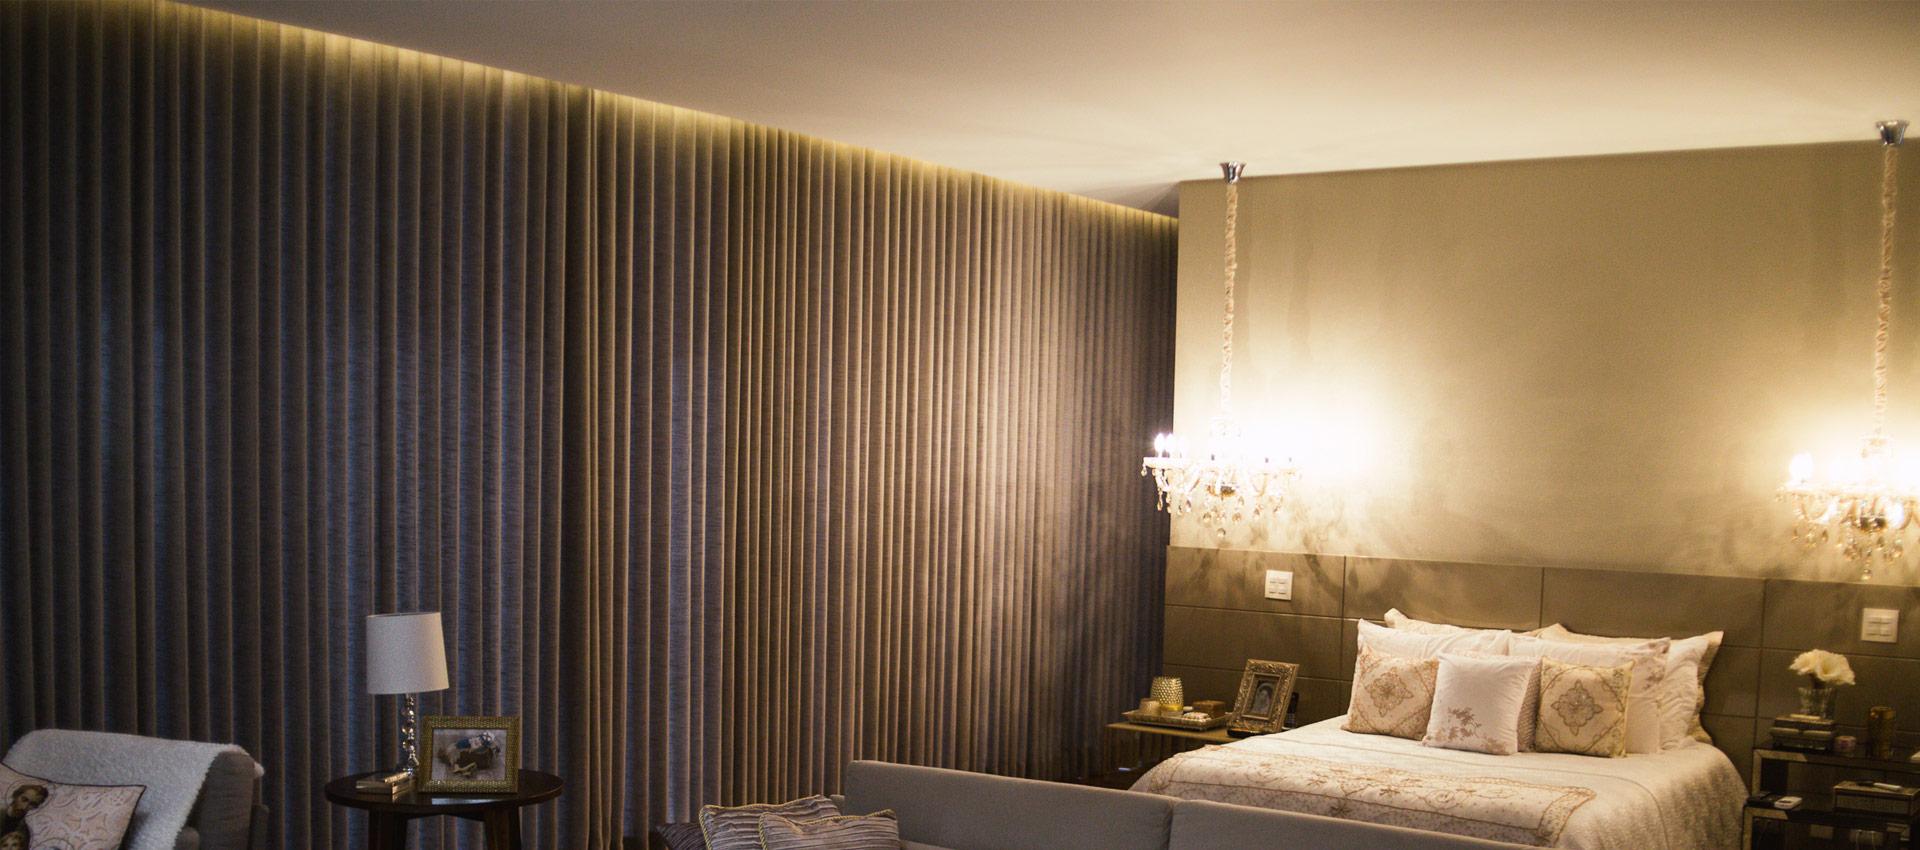 cortina-tecido-01